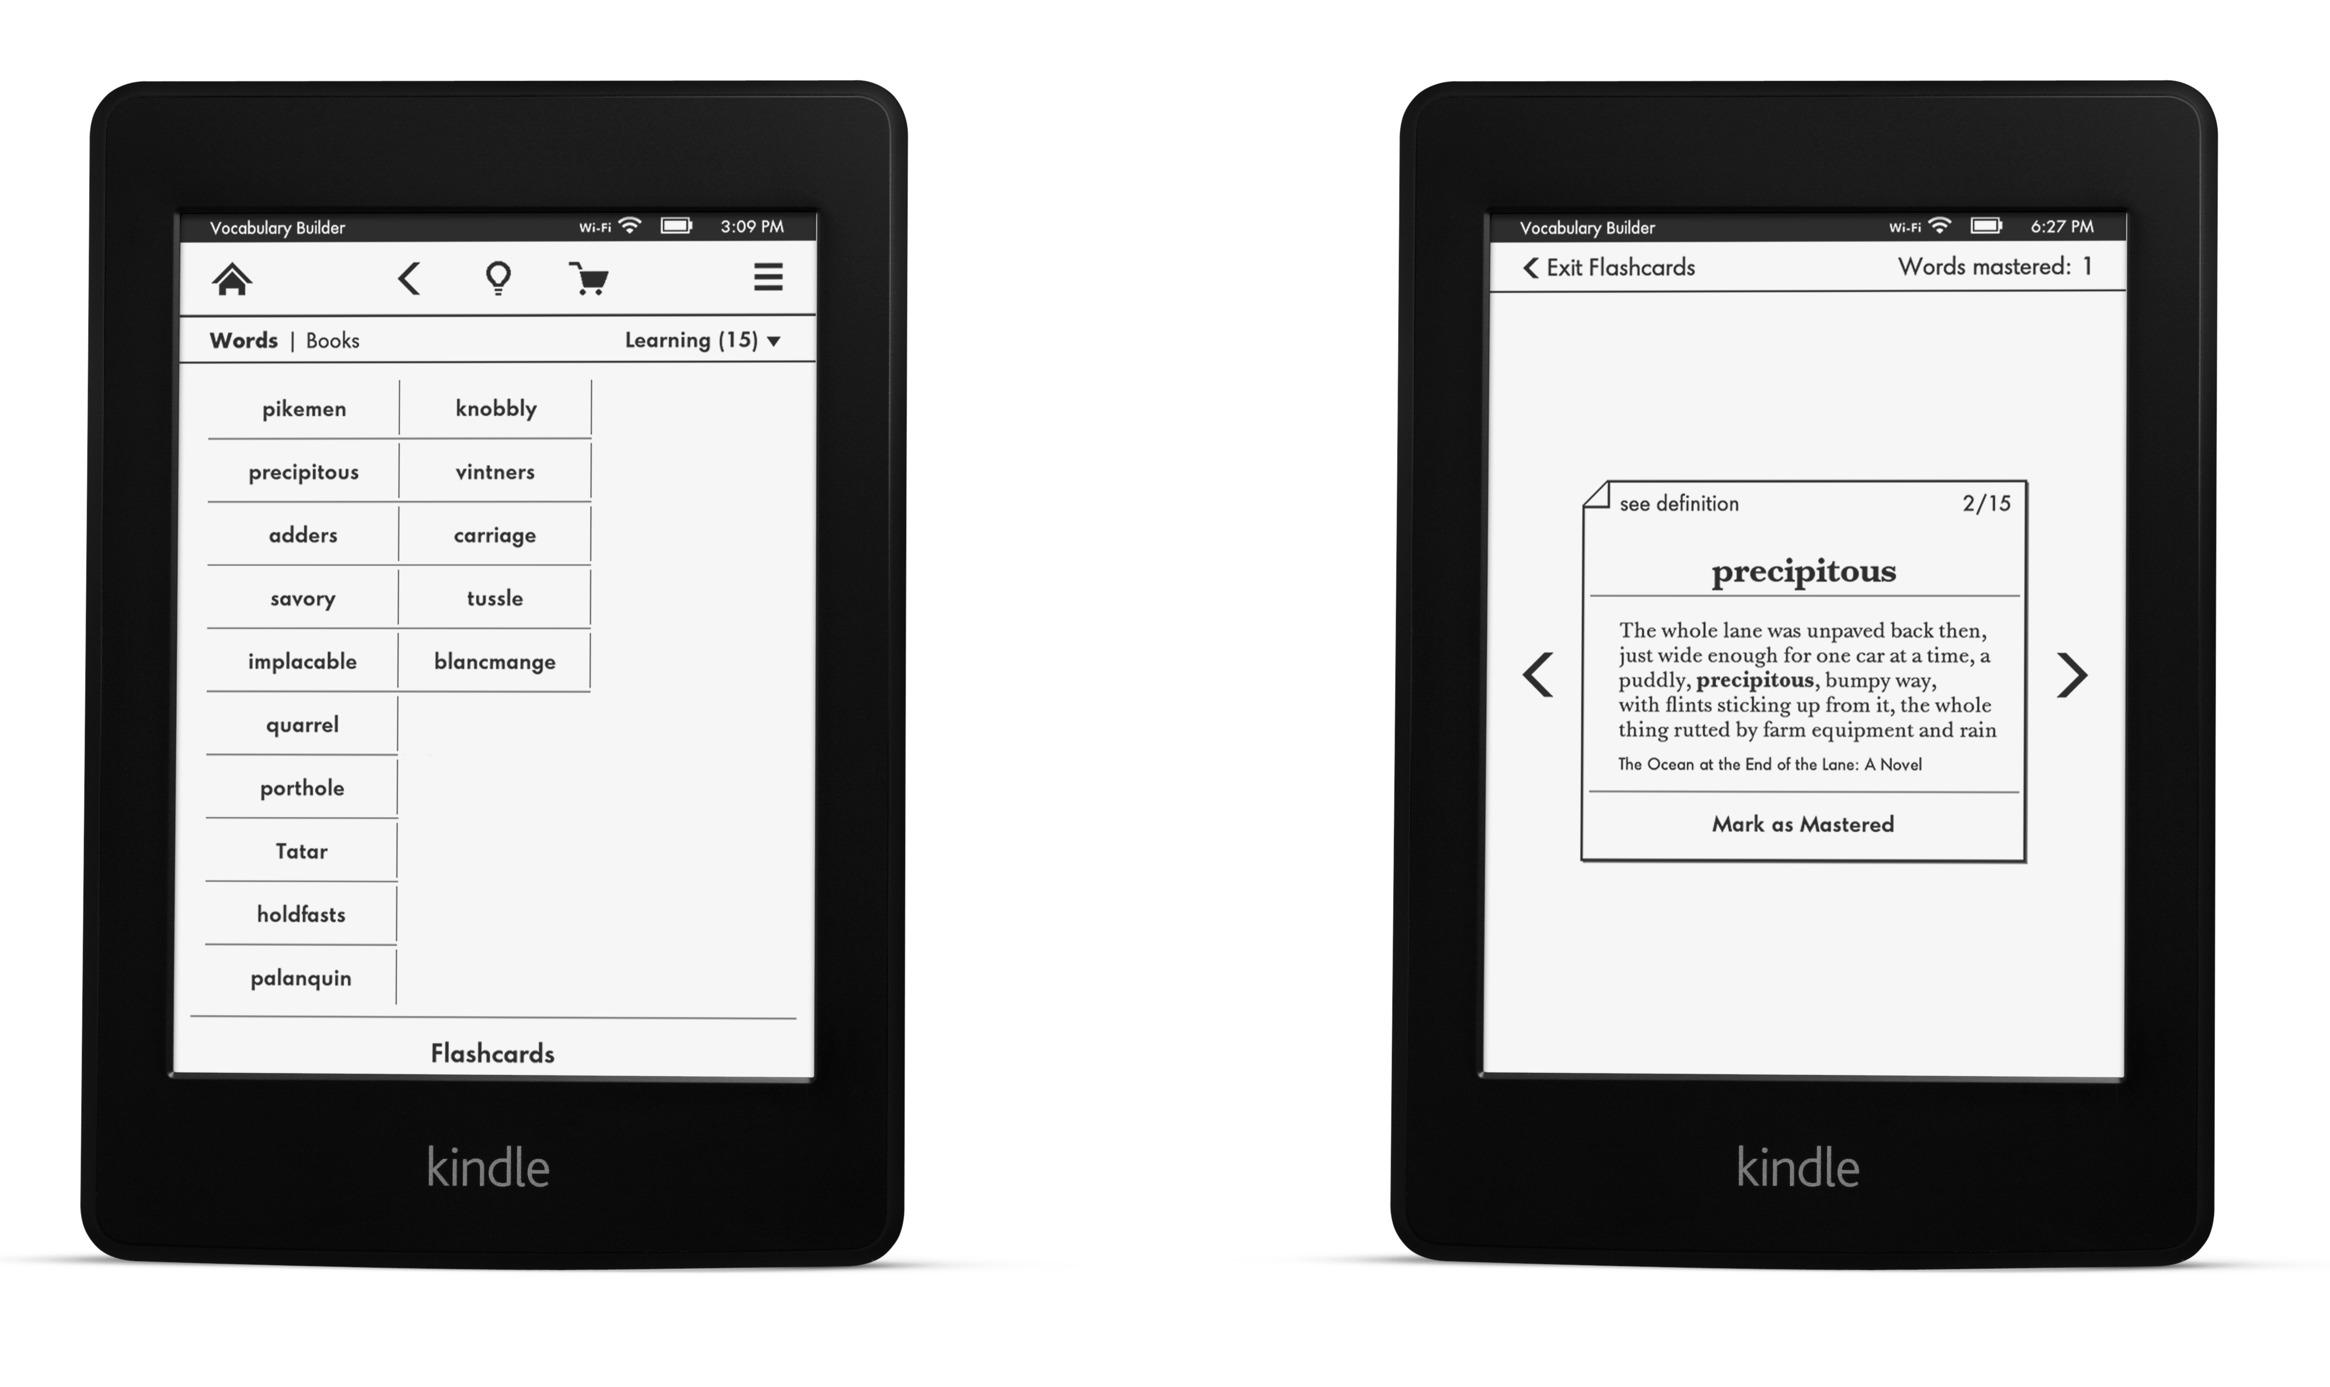 Amazon Announces New Kindle Paperwhite - TidBITS